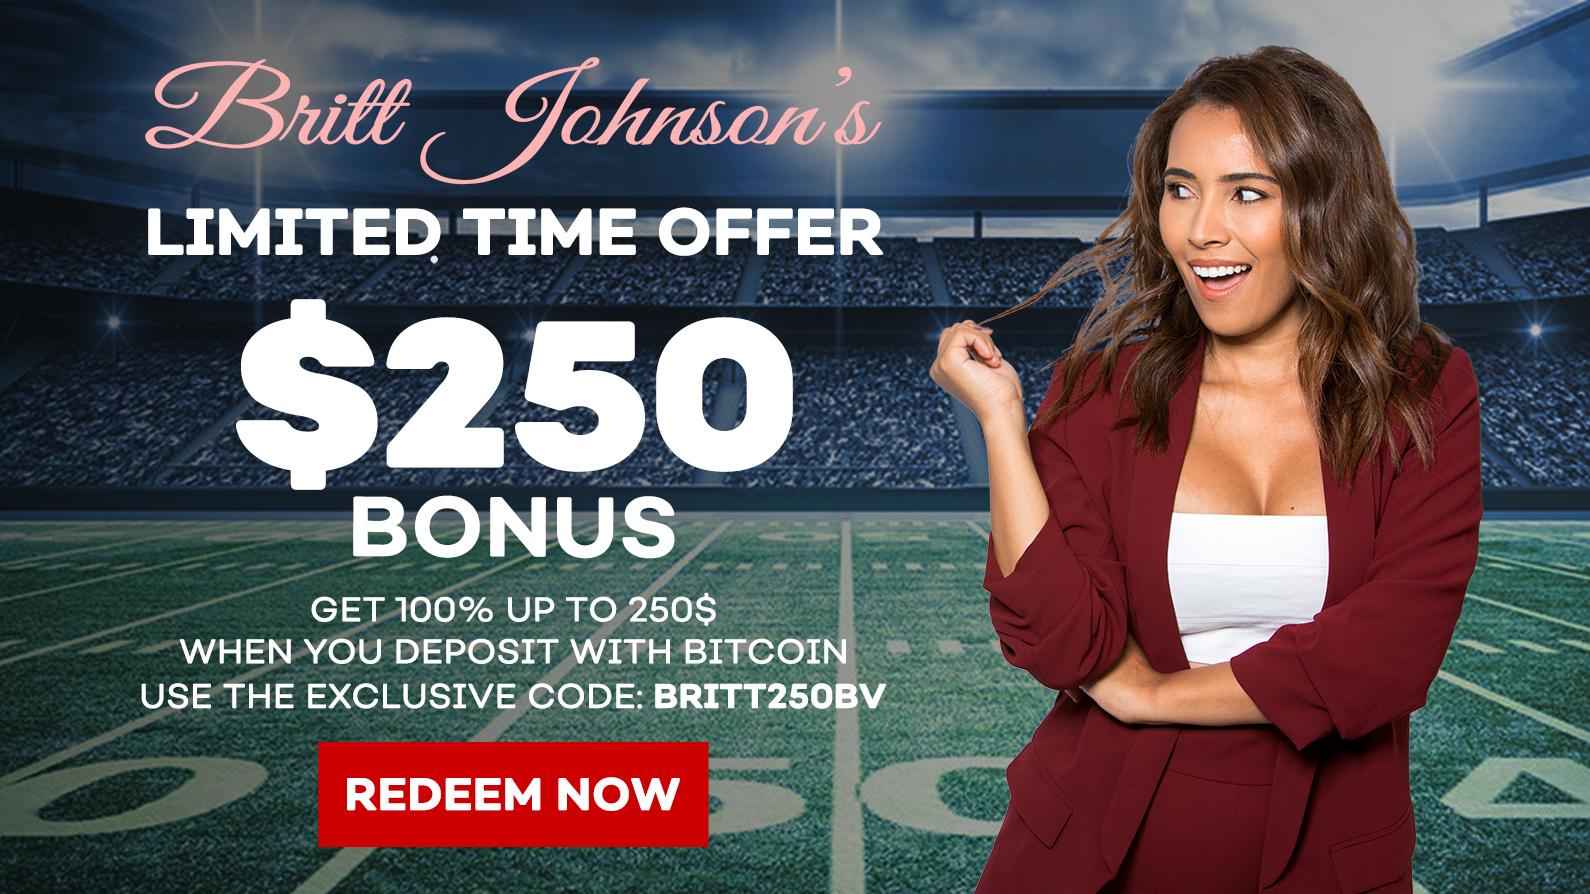 BRITT JOHNSON'S NFL 2020 BOLD PREDICTIONS